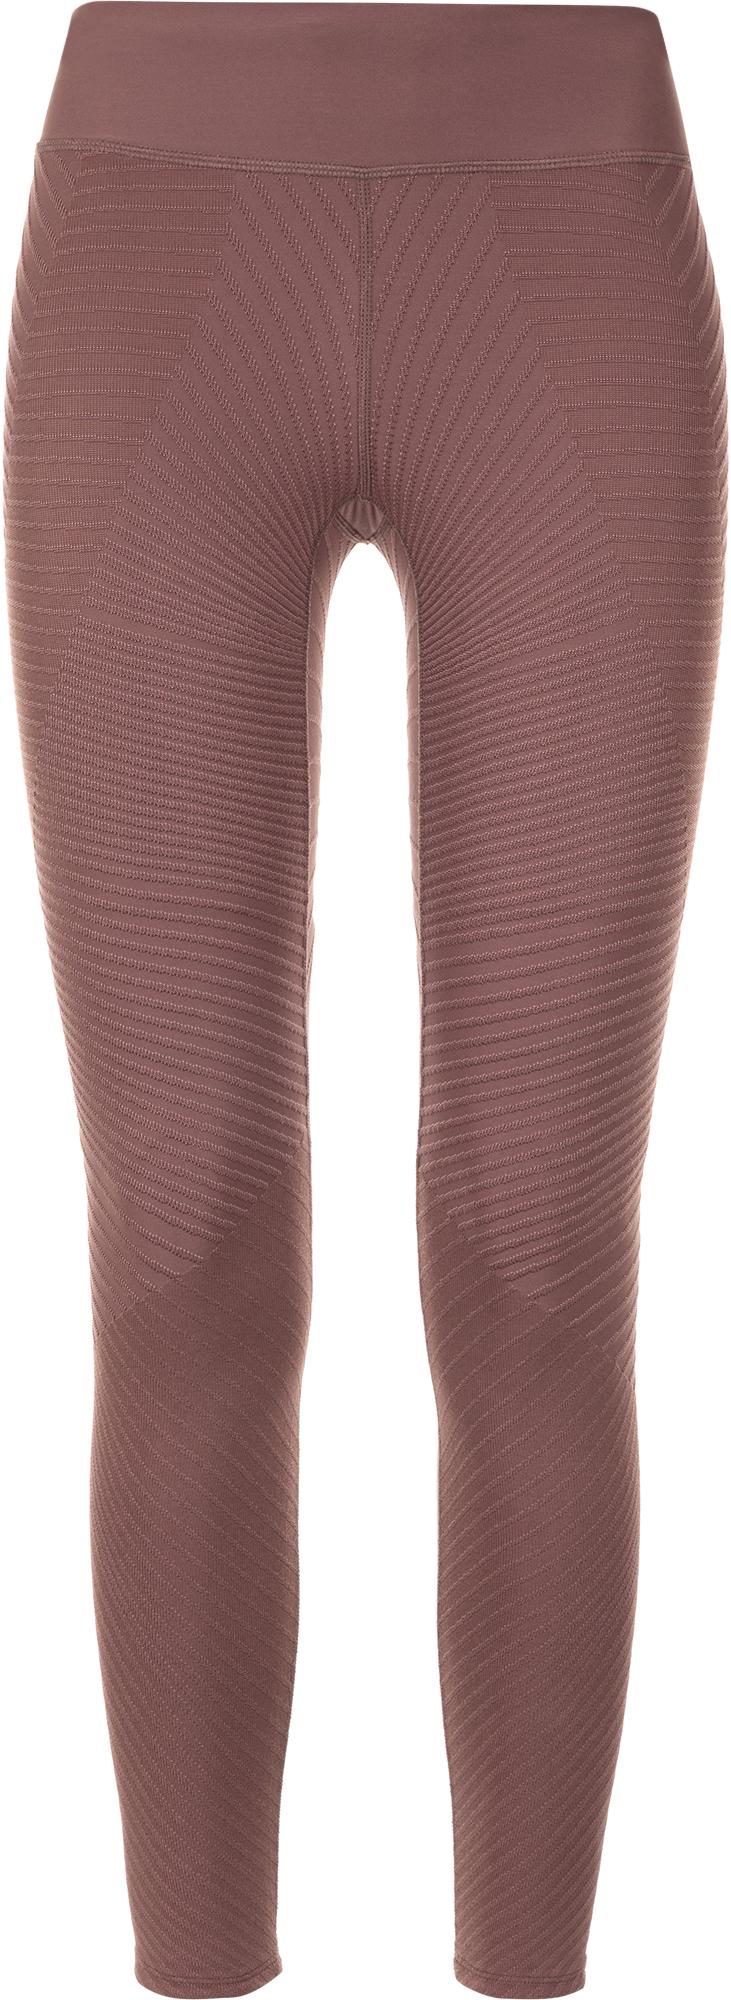 Nike Легинсы женские Epic Lux, размер 42-44